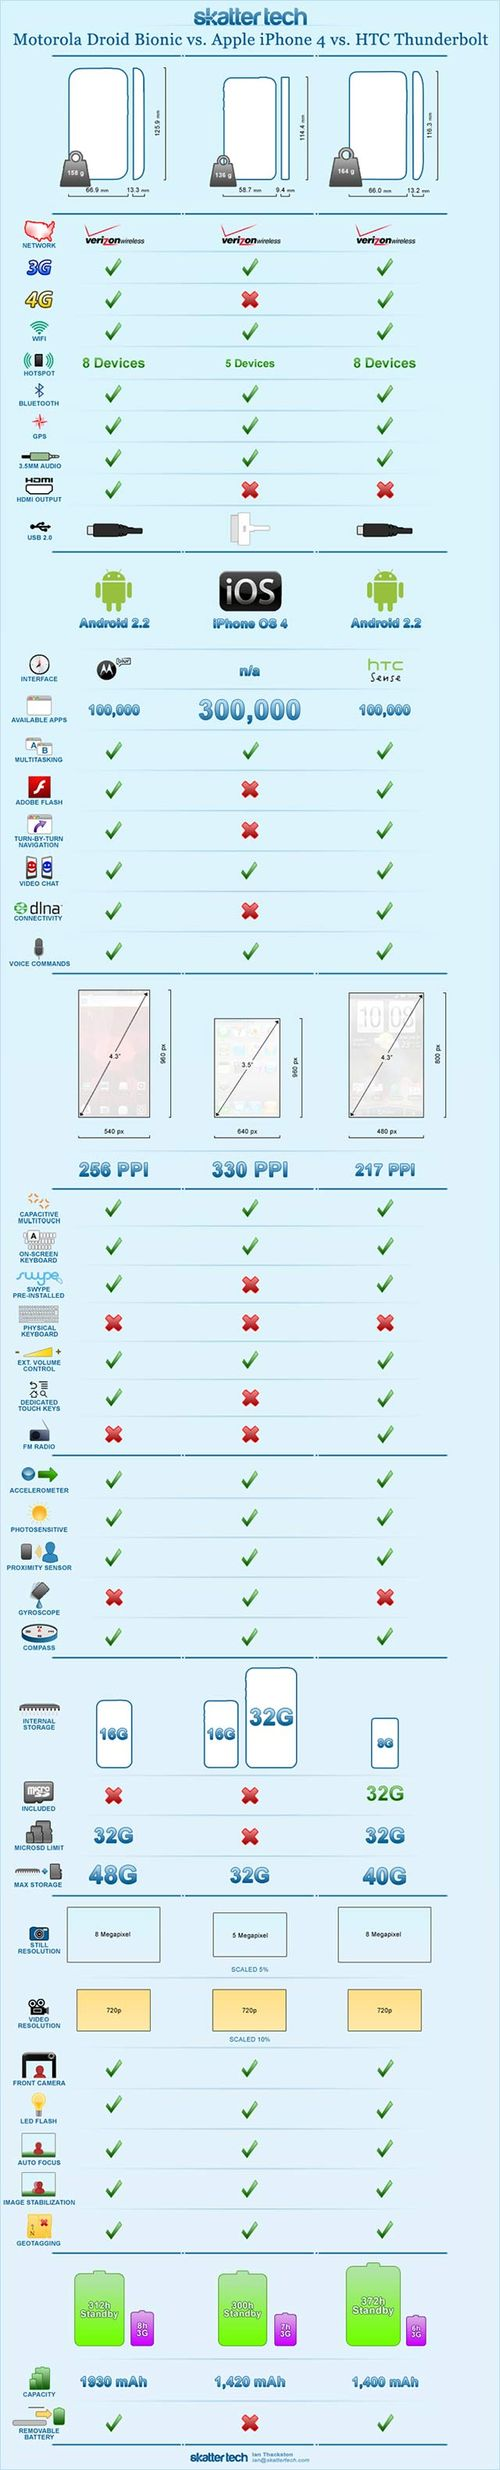 Infographic-droid-bionic-vs-iphone-4-vs-thunderbolt-small